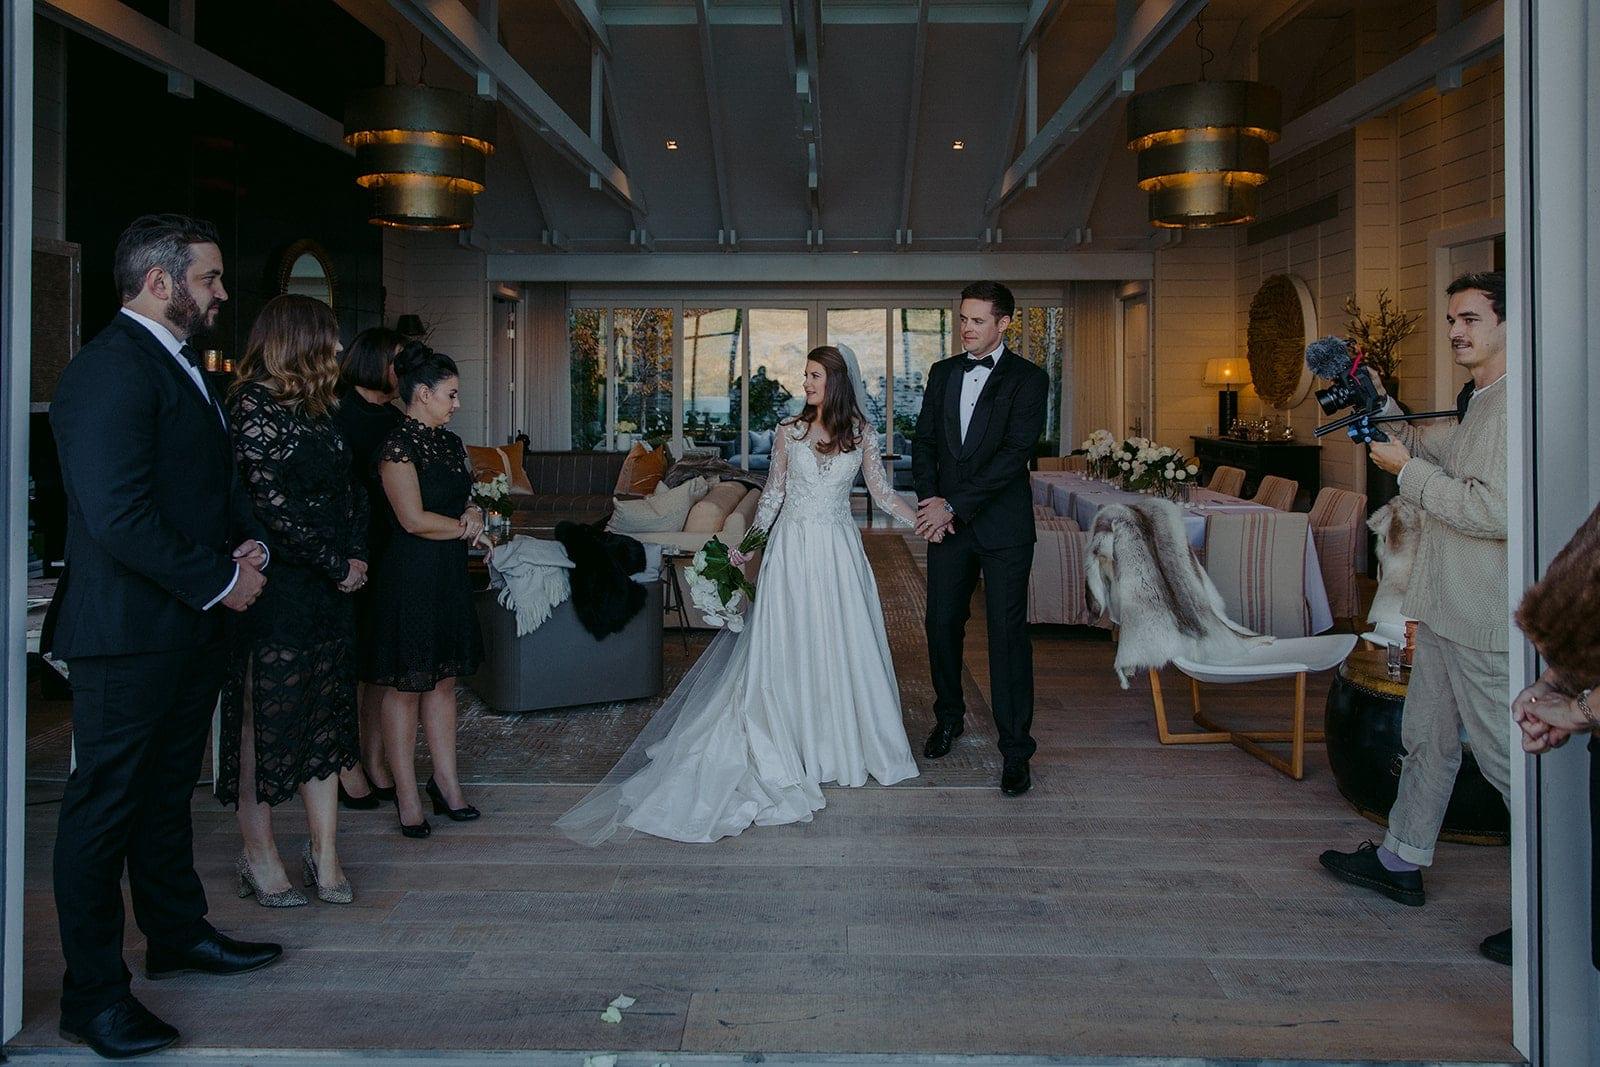 Real Weddings | Vinka Design | Real Brides Wearing Vinka Gowns | Sara and Ben wedding reception